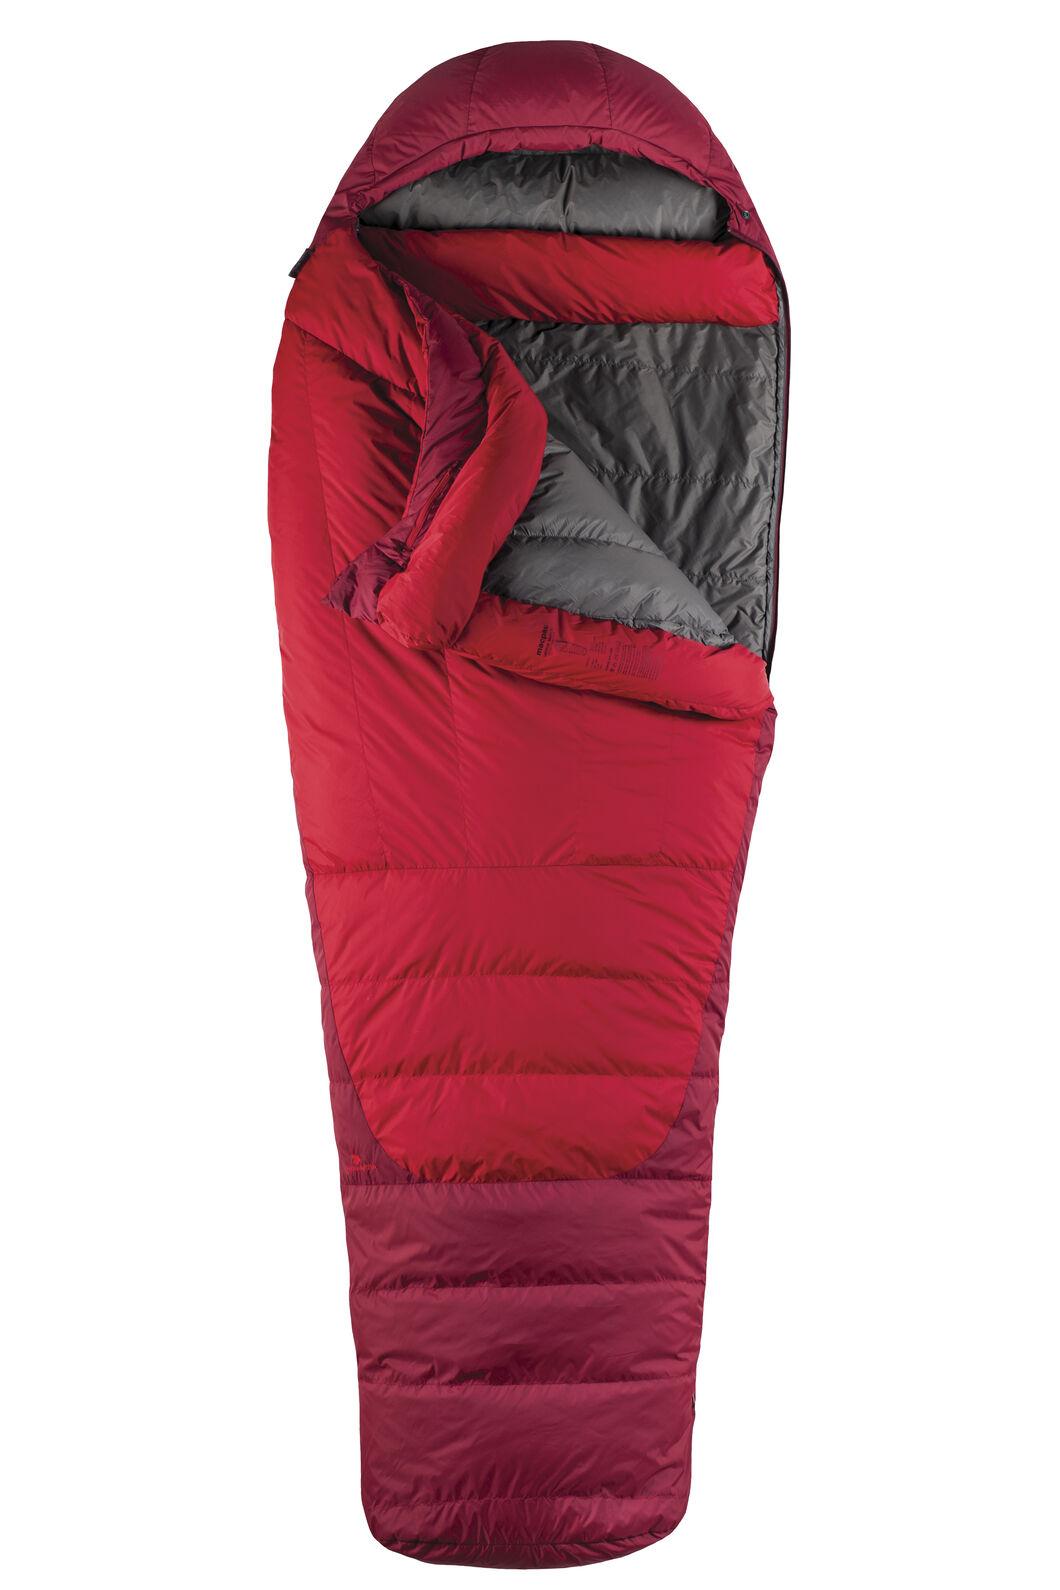 Macpac Latitude XP Goose Down 500 Sleeping Bag - Standard, Chilli, hi-res